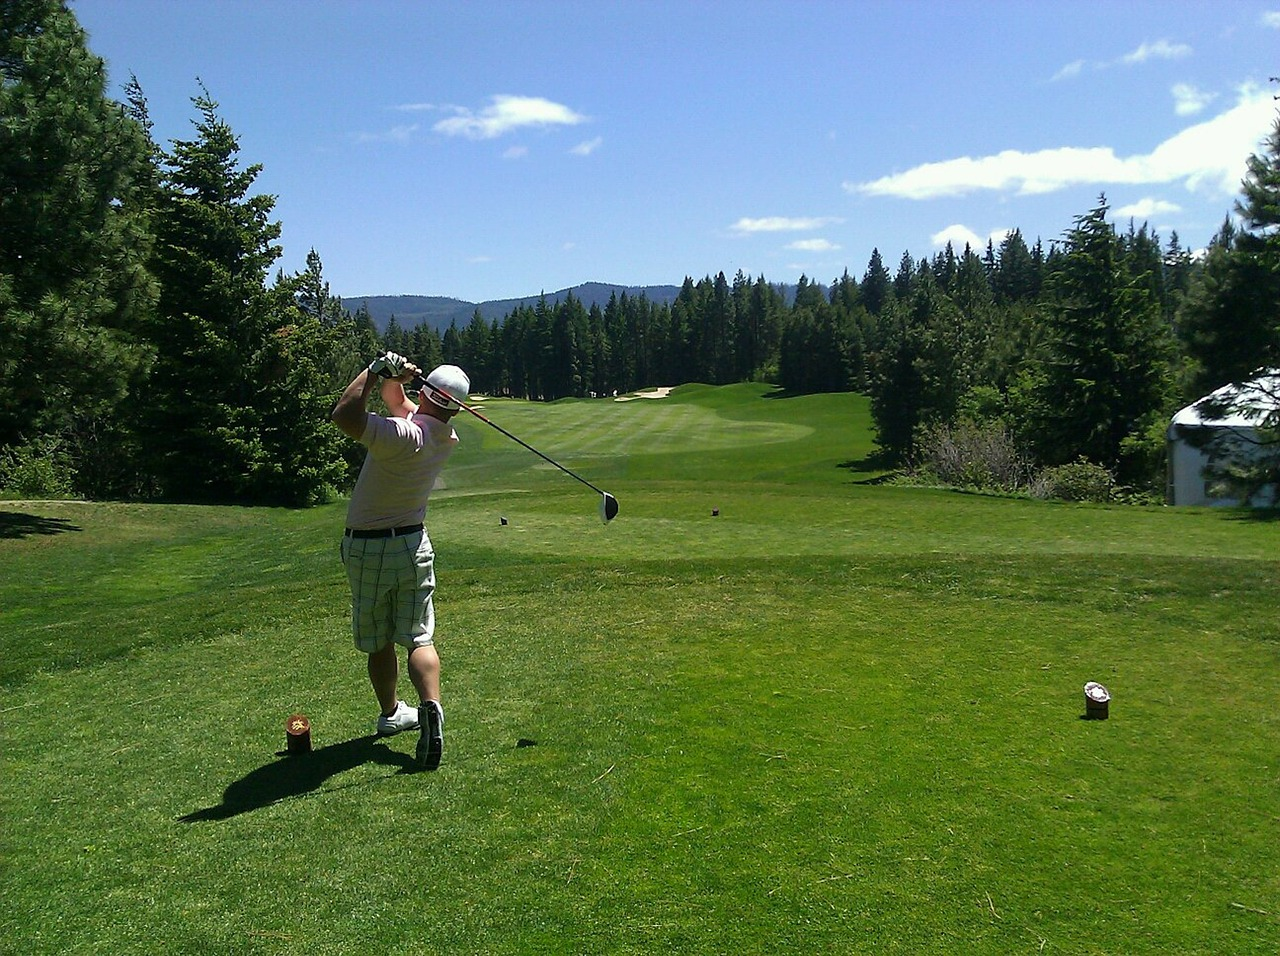 golfing-78257_1280